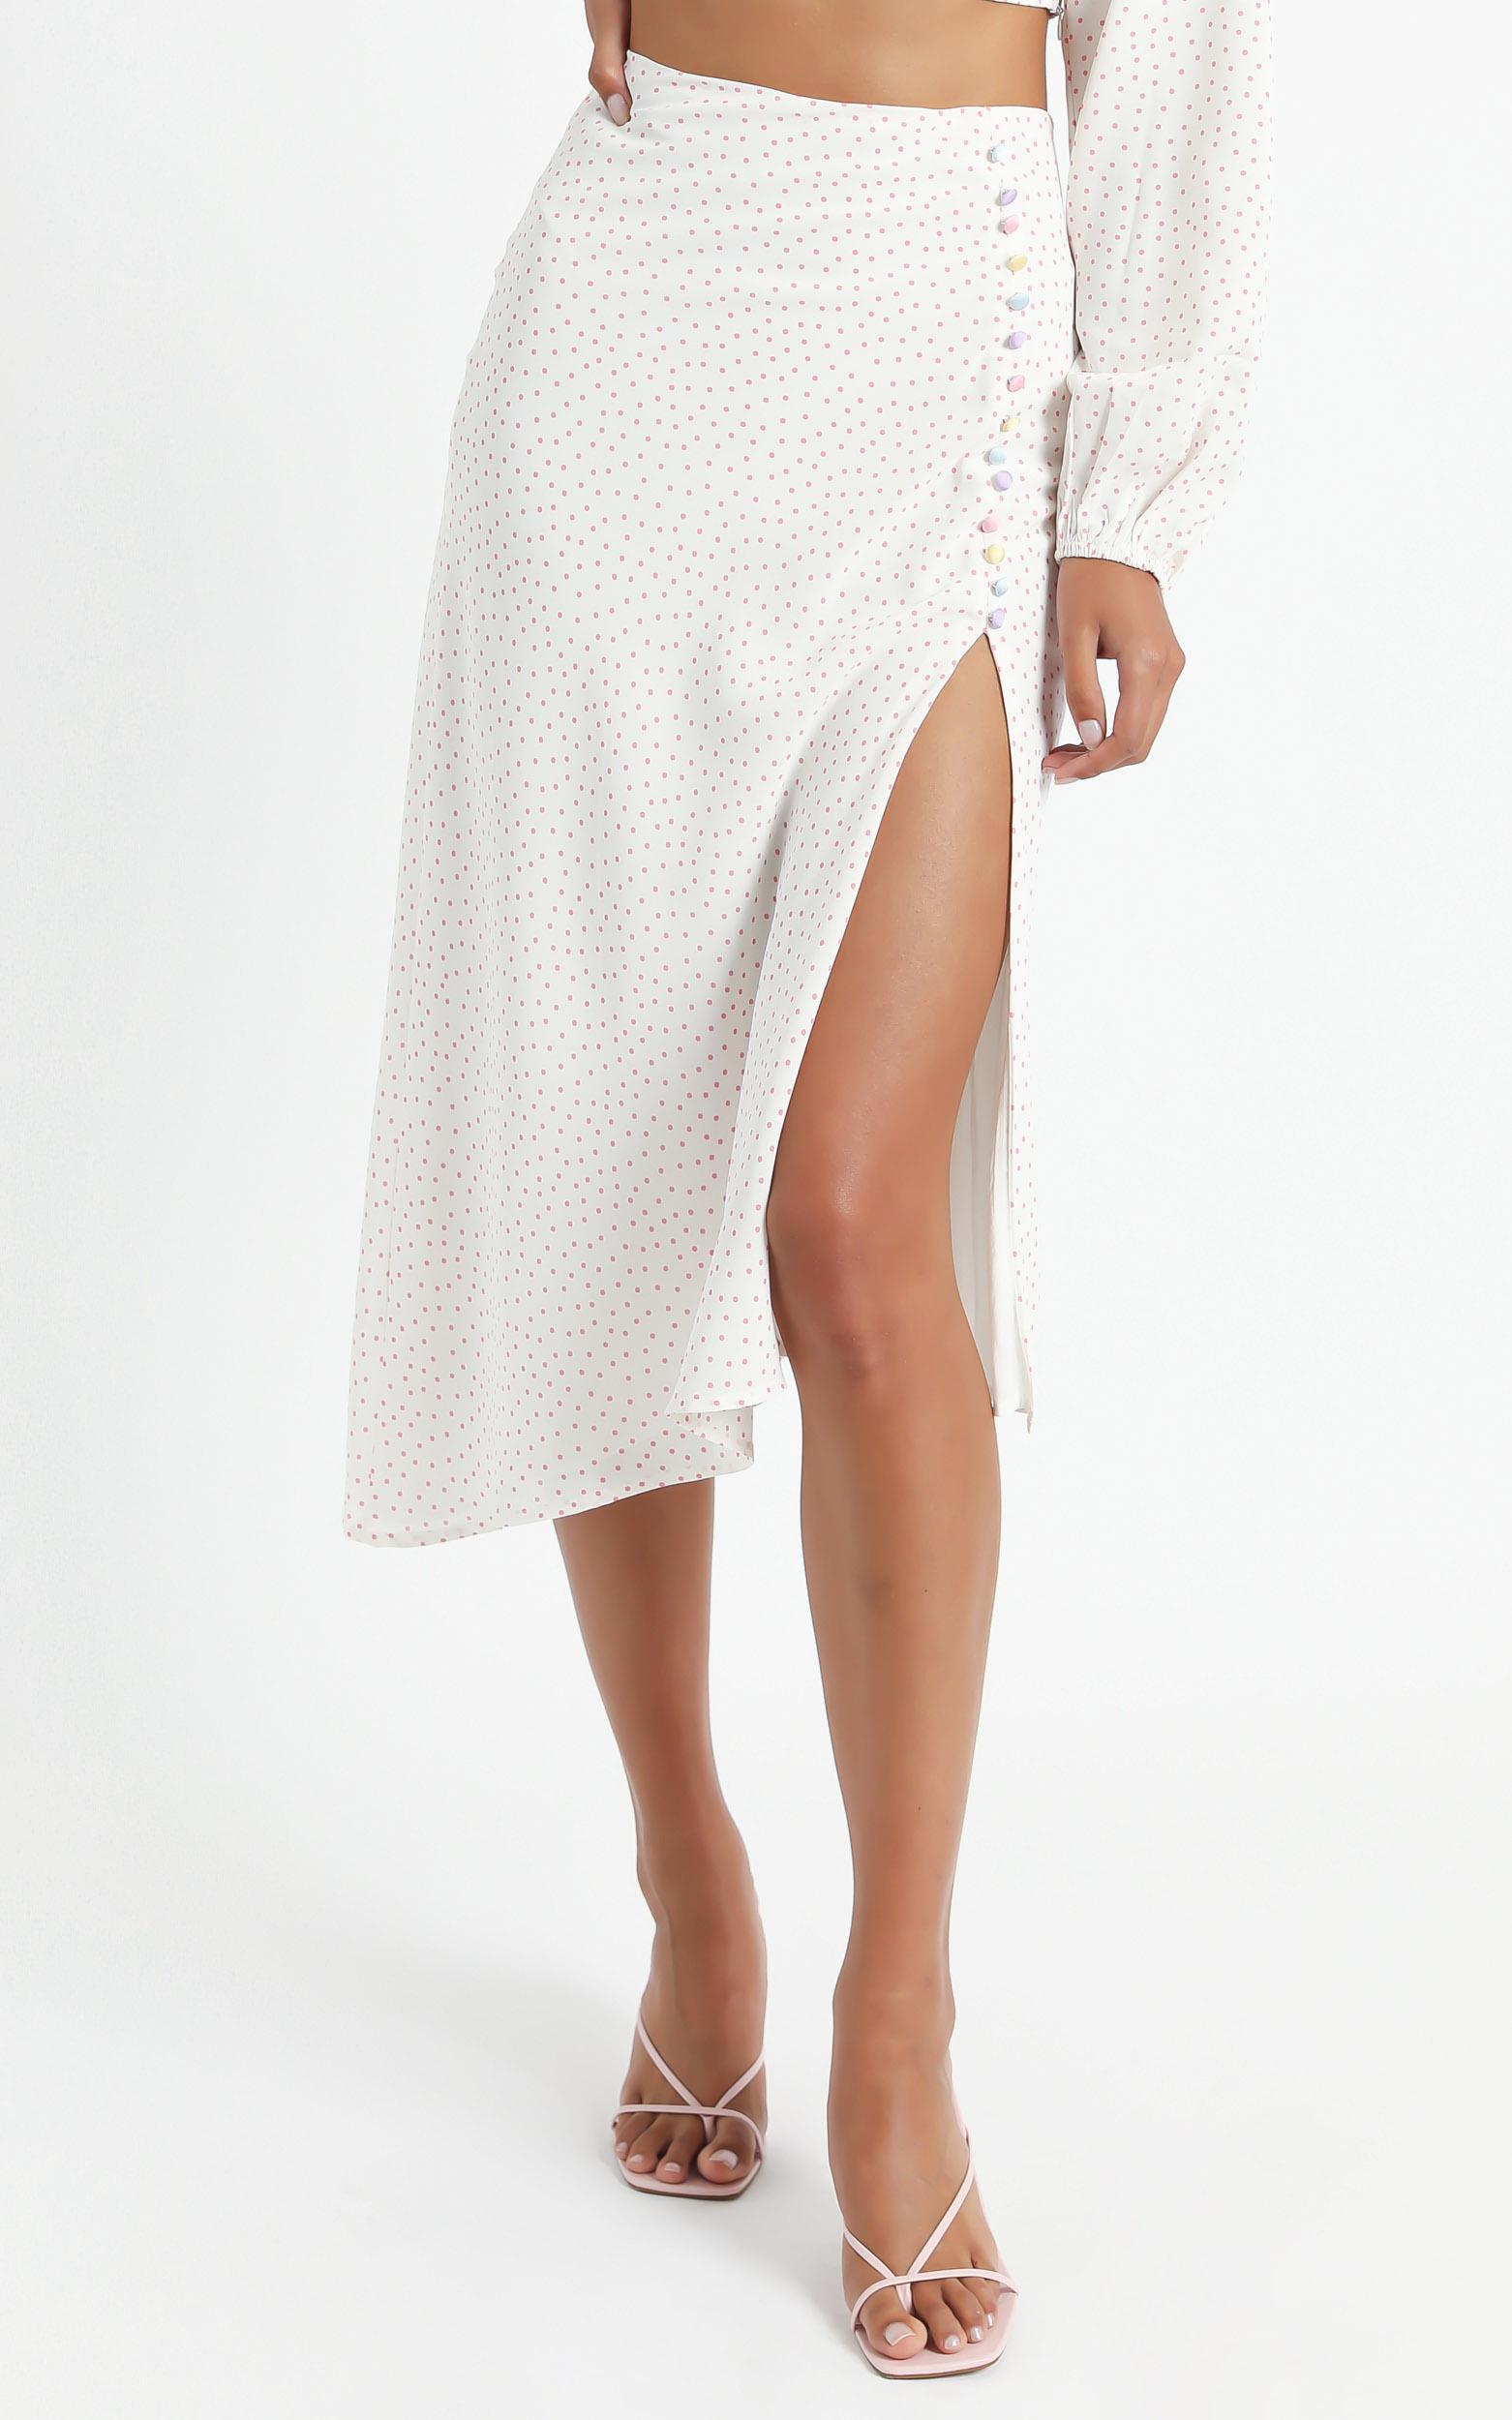 Kailu Skirt in Pink Polka Dot - 6 (XS), Pink, hi-res image number null